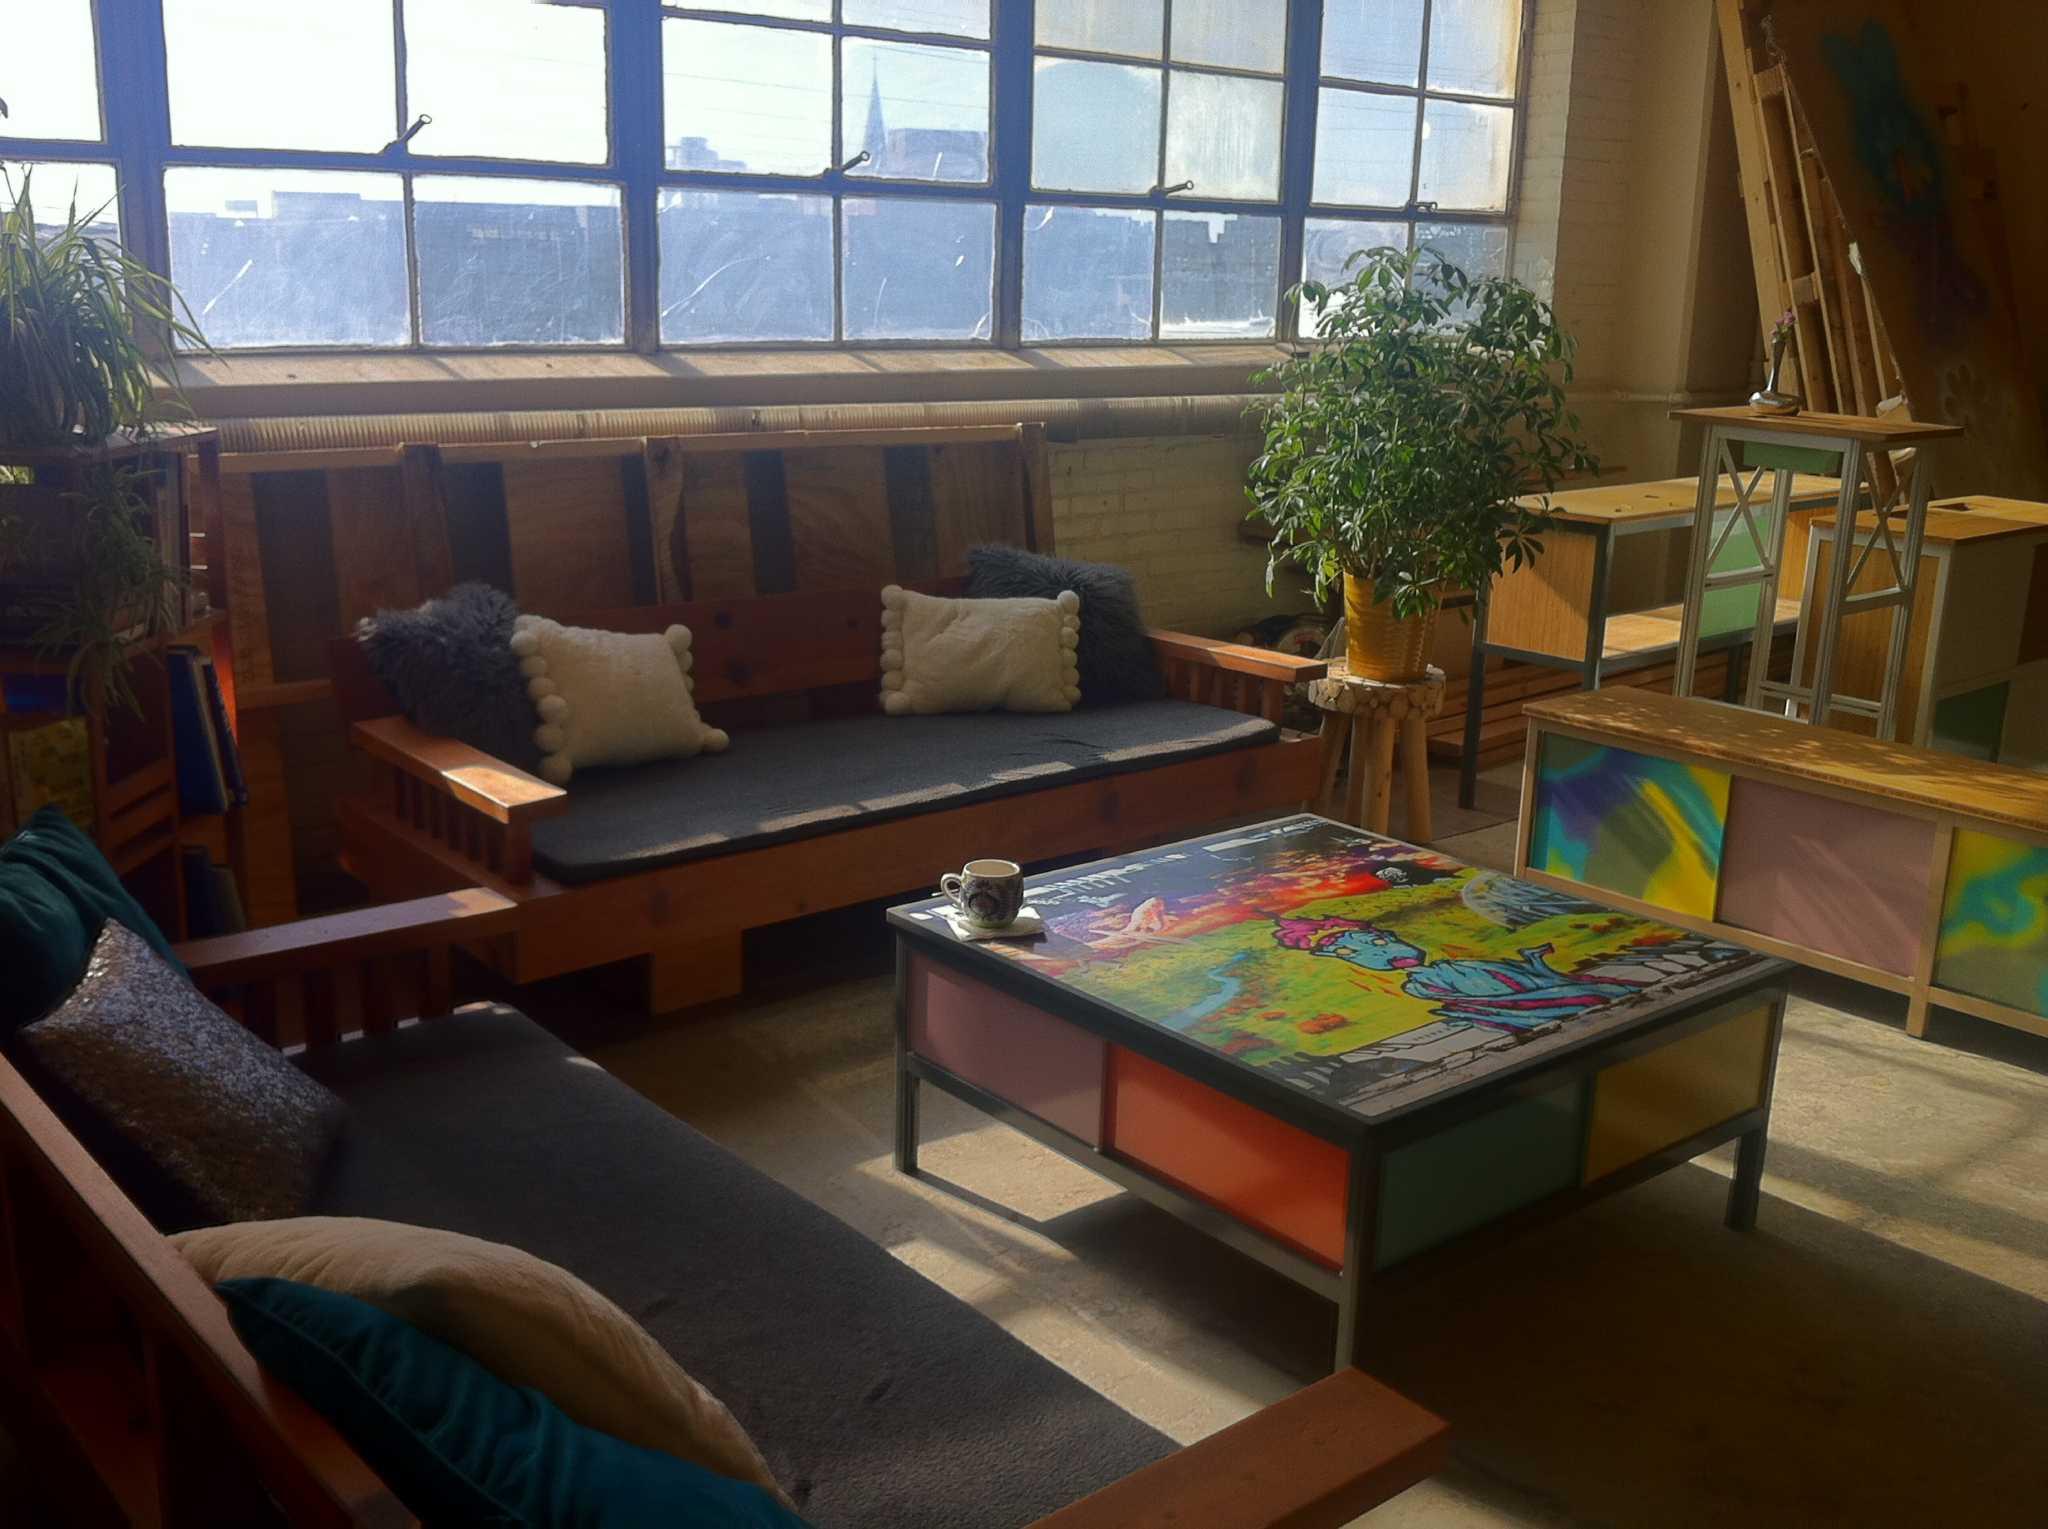 Bridgeport furniture makers modern modular line leaves room for creativity